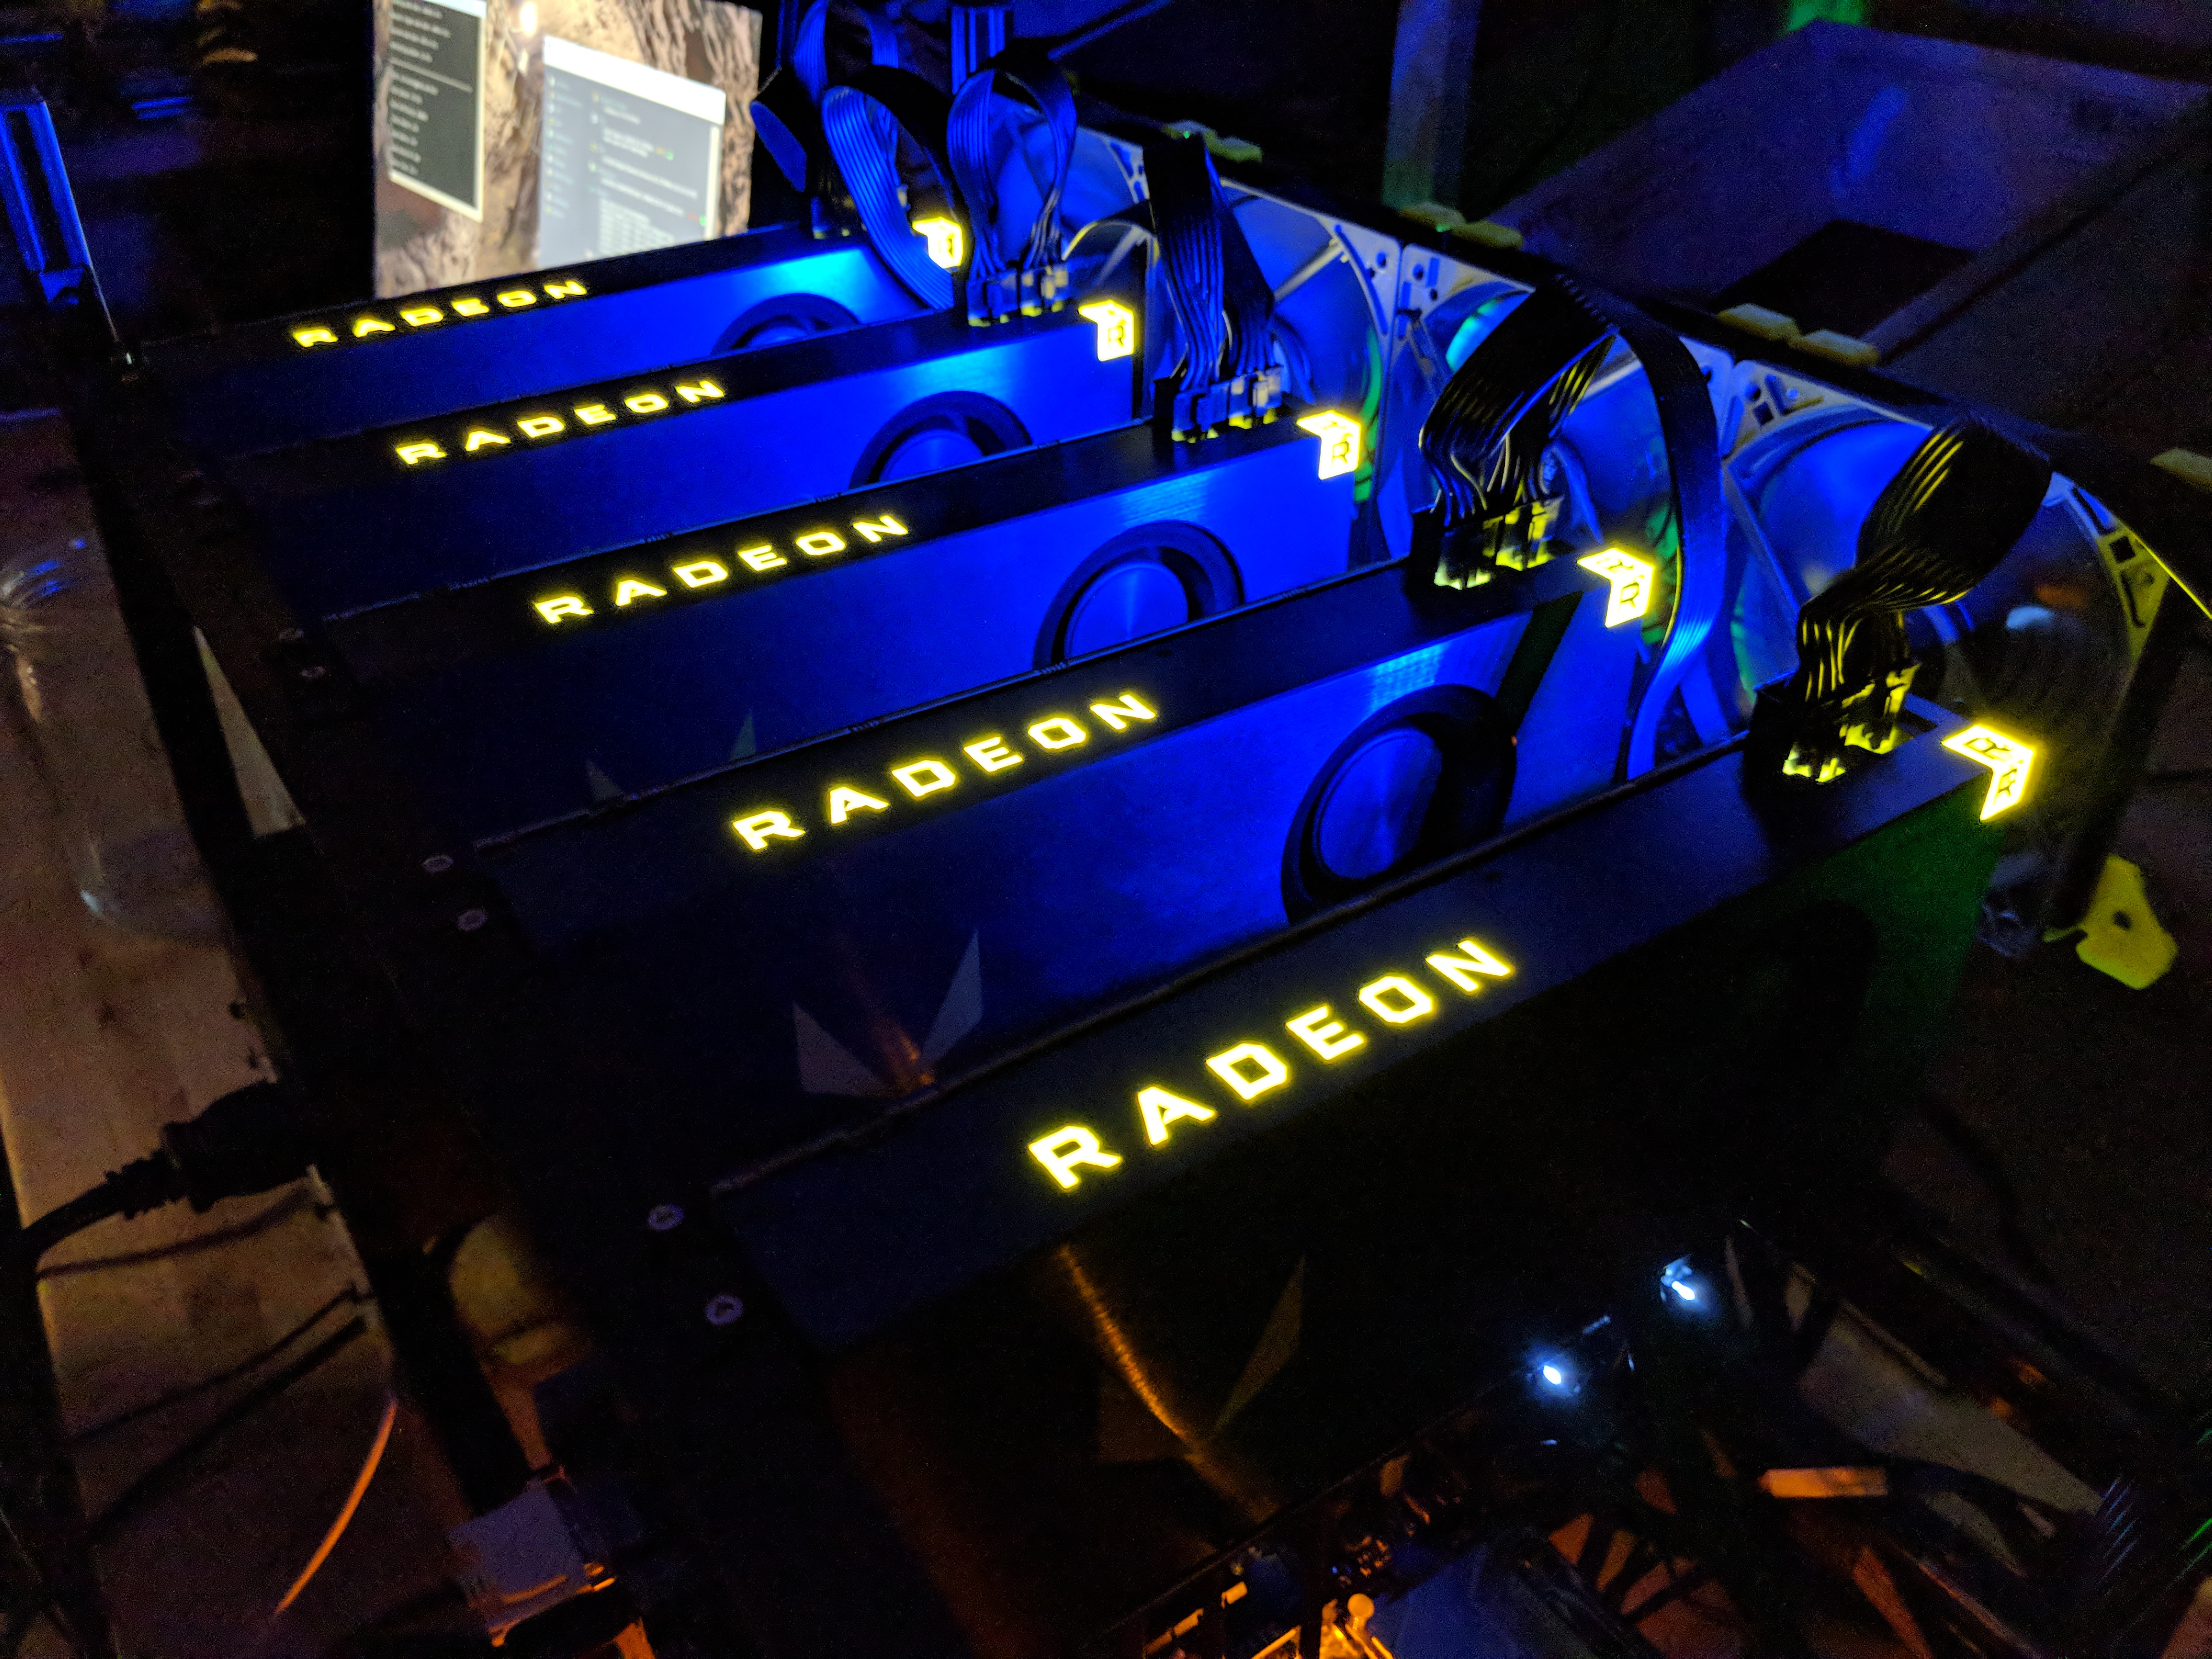 Building RX Vega Frontier Edition 5x GPU Mining Rig